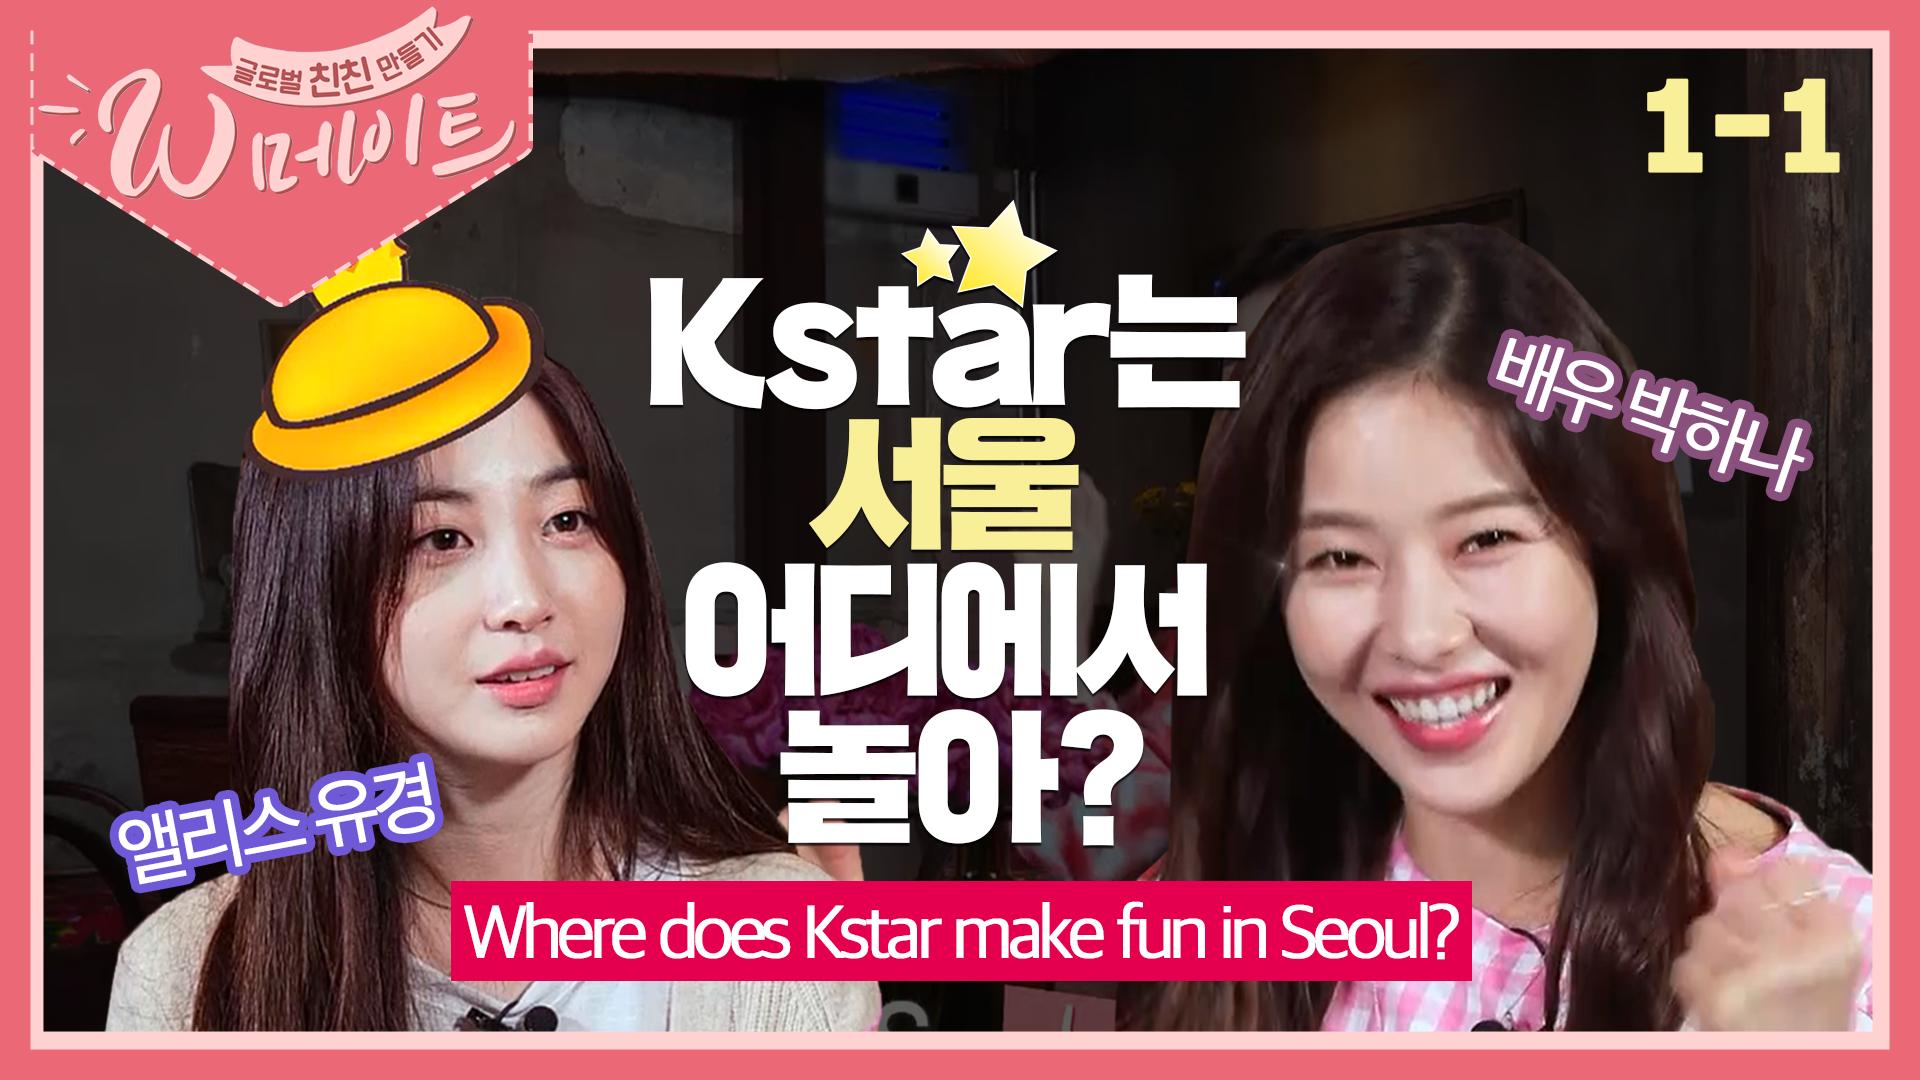 W메이트 1화 - Kstar는 서울 어디에서 놀아?